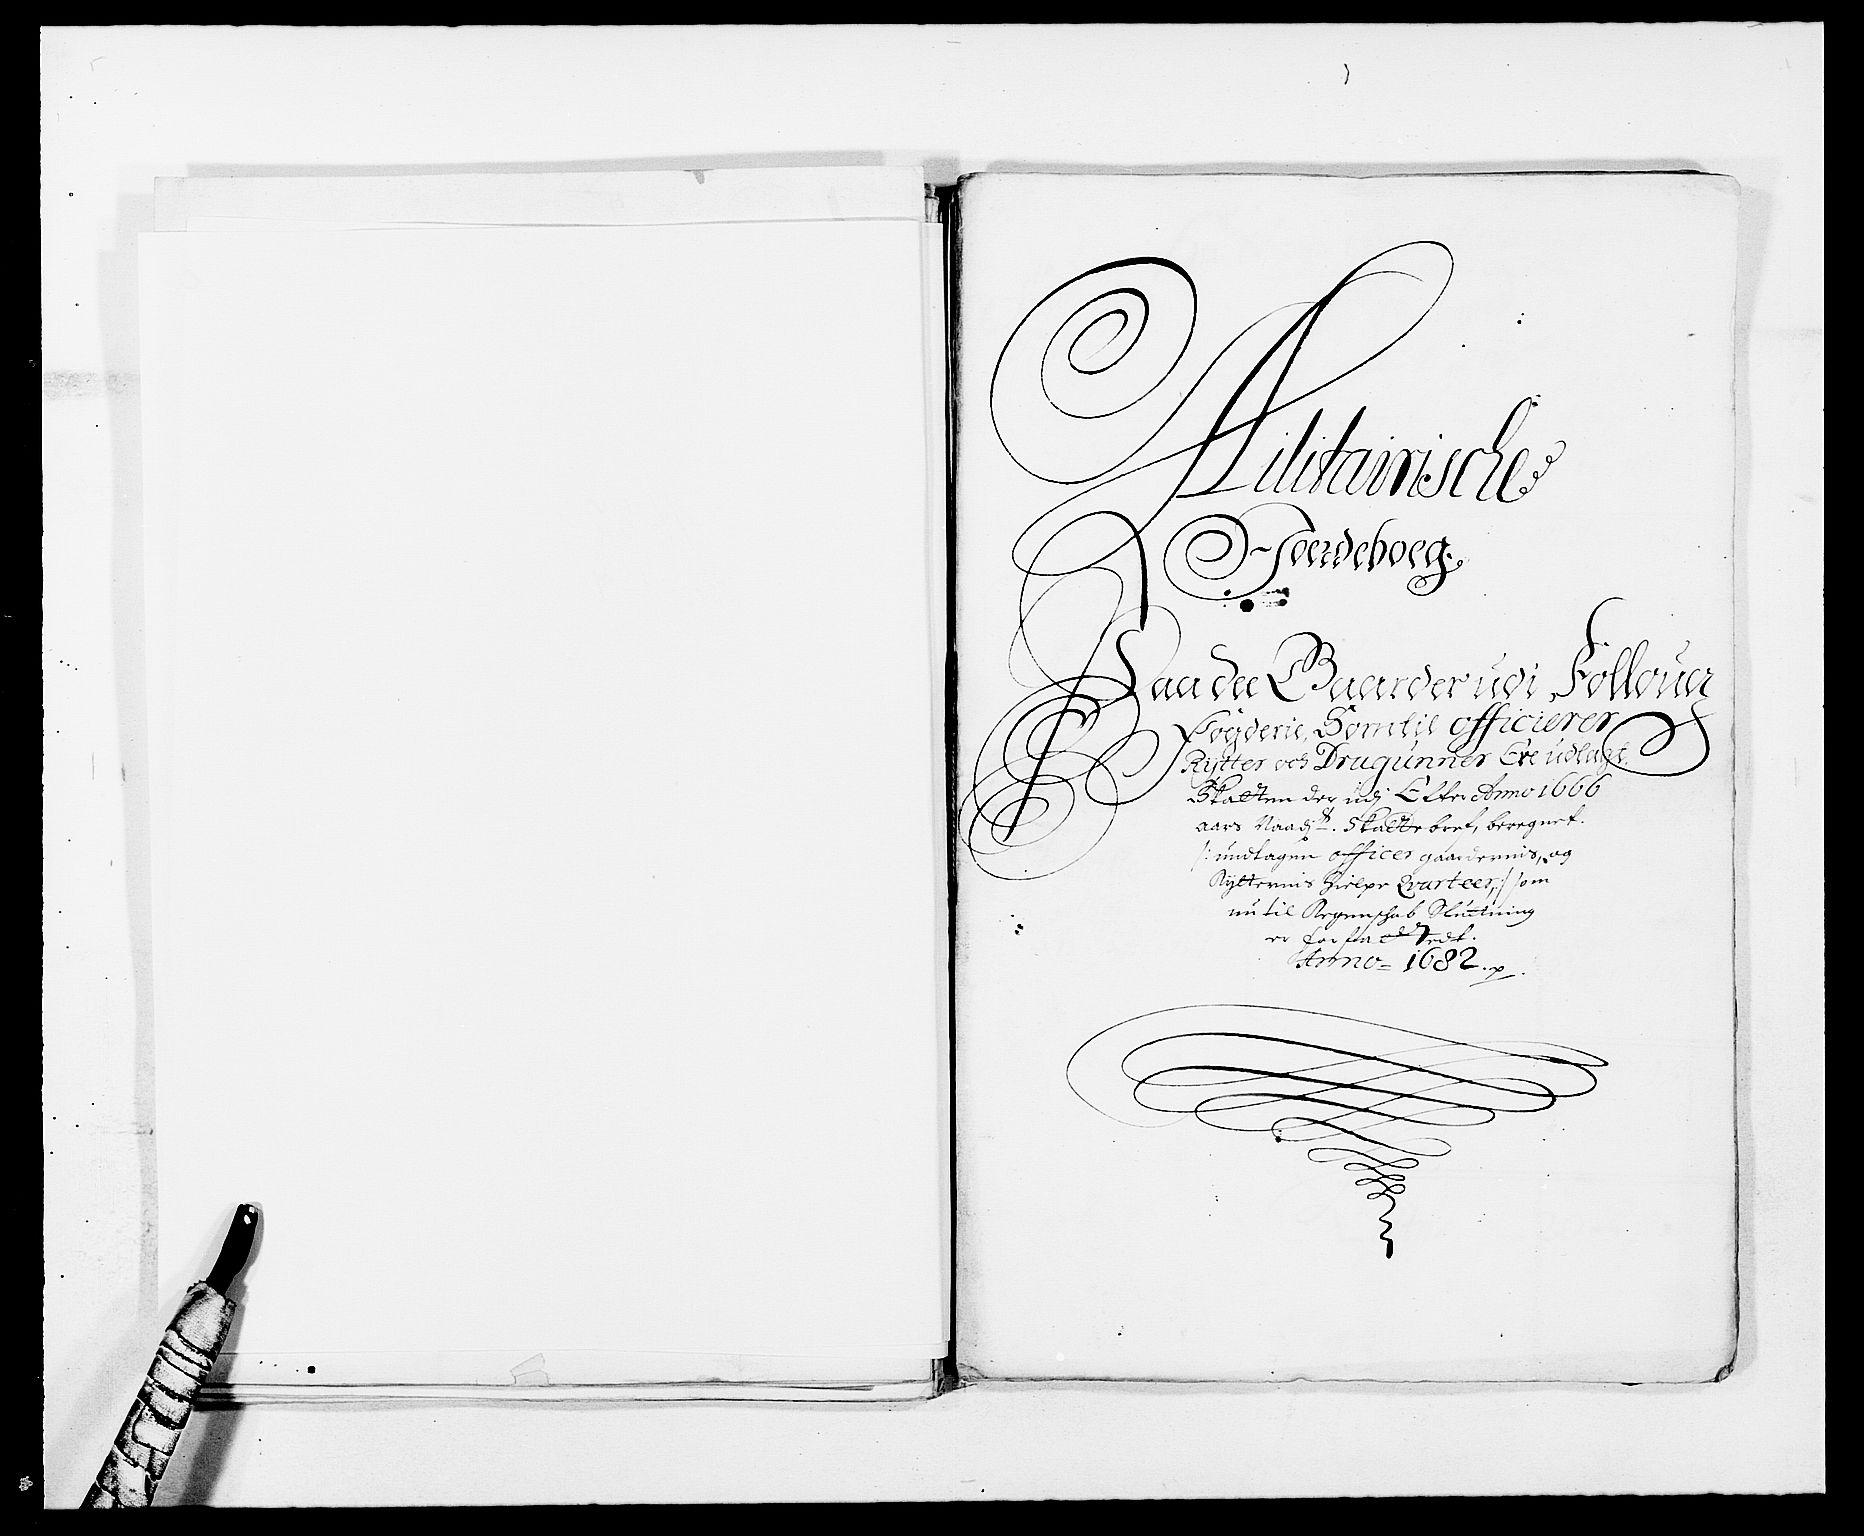 RA, Rentekammeret inntil 1814, Reviderte regnskaper, Fogderegnskap, R09/L0432: Fogderegnskap Follo, 1680-1684, s. 61